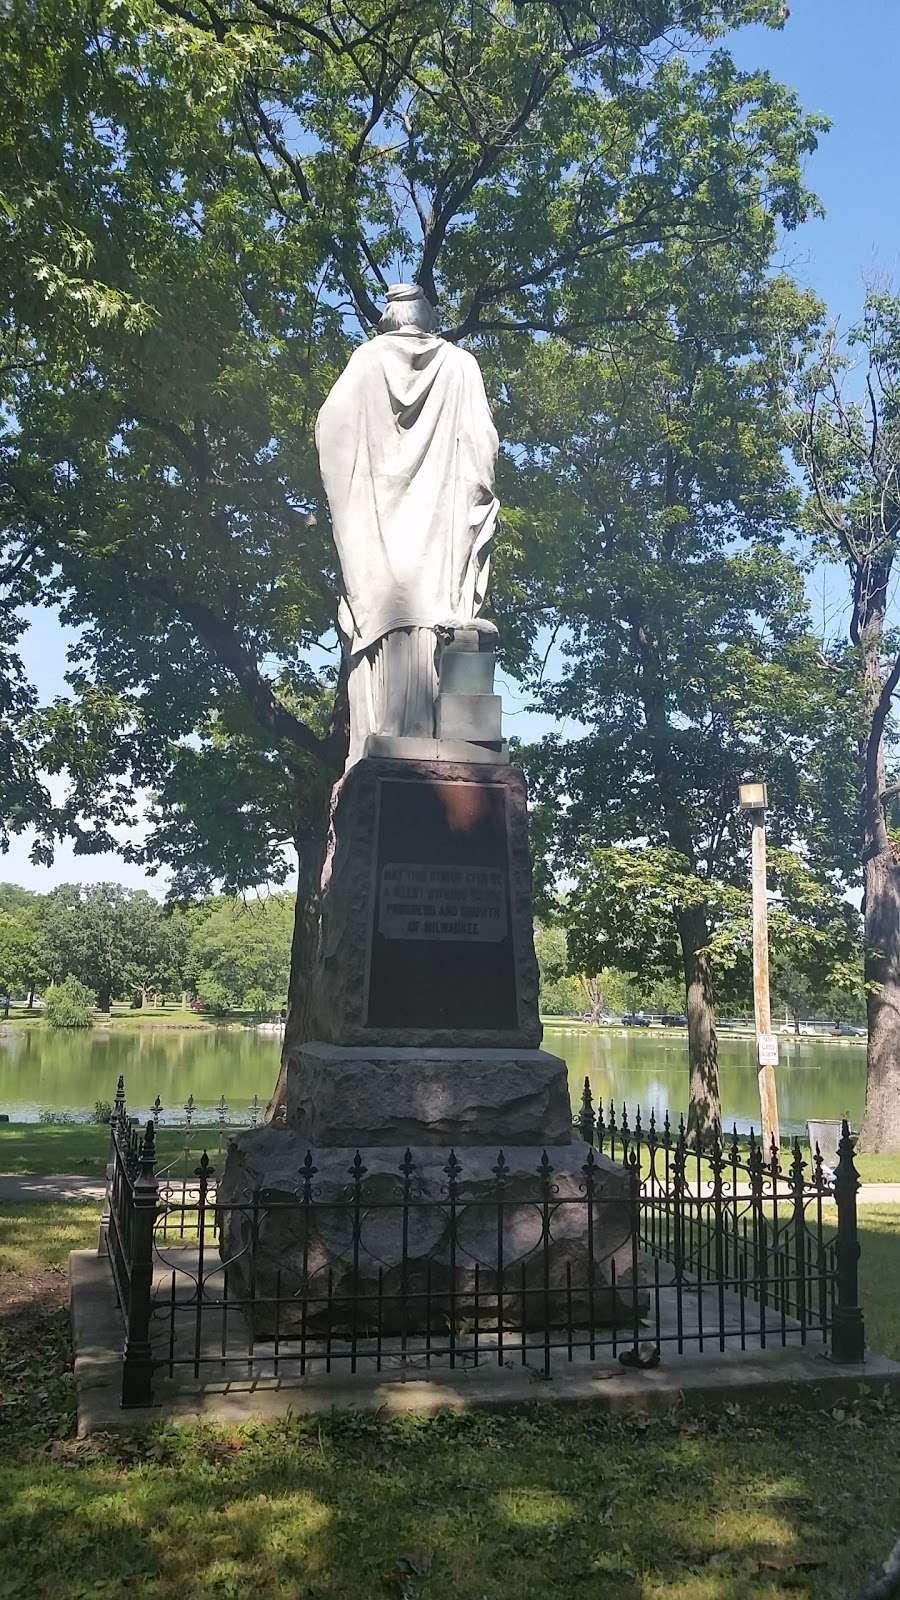 Jackson Park - park  | Photo 10 of 10 | Address: 3500 W Forest Home Ave, Milwaukee, WI 53215, USA | Phone: (414) 257-7275